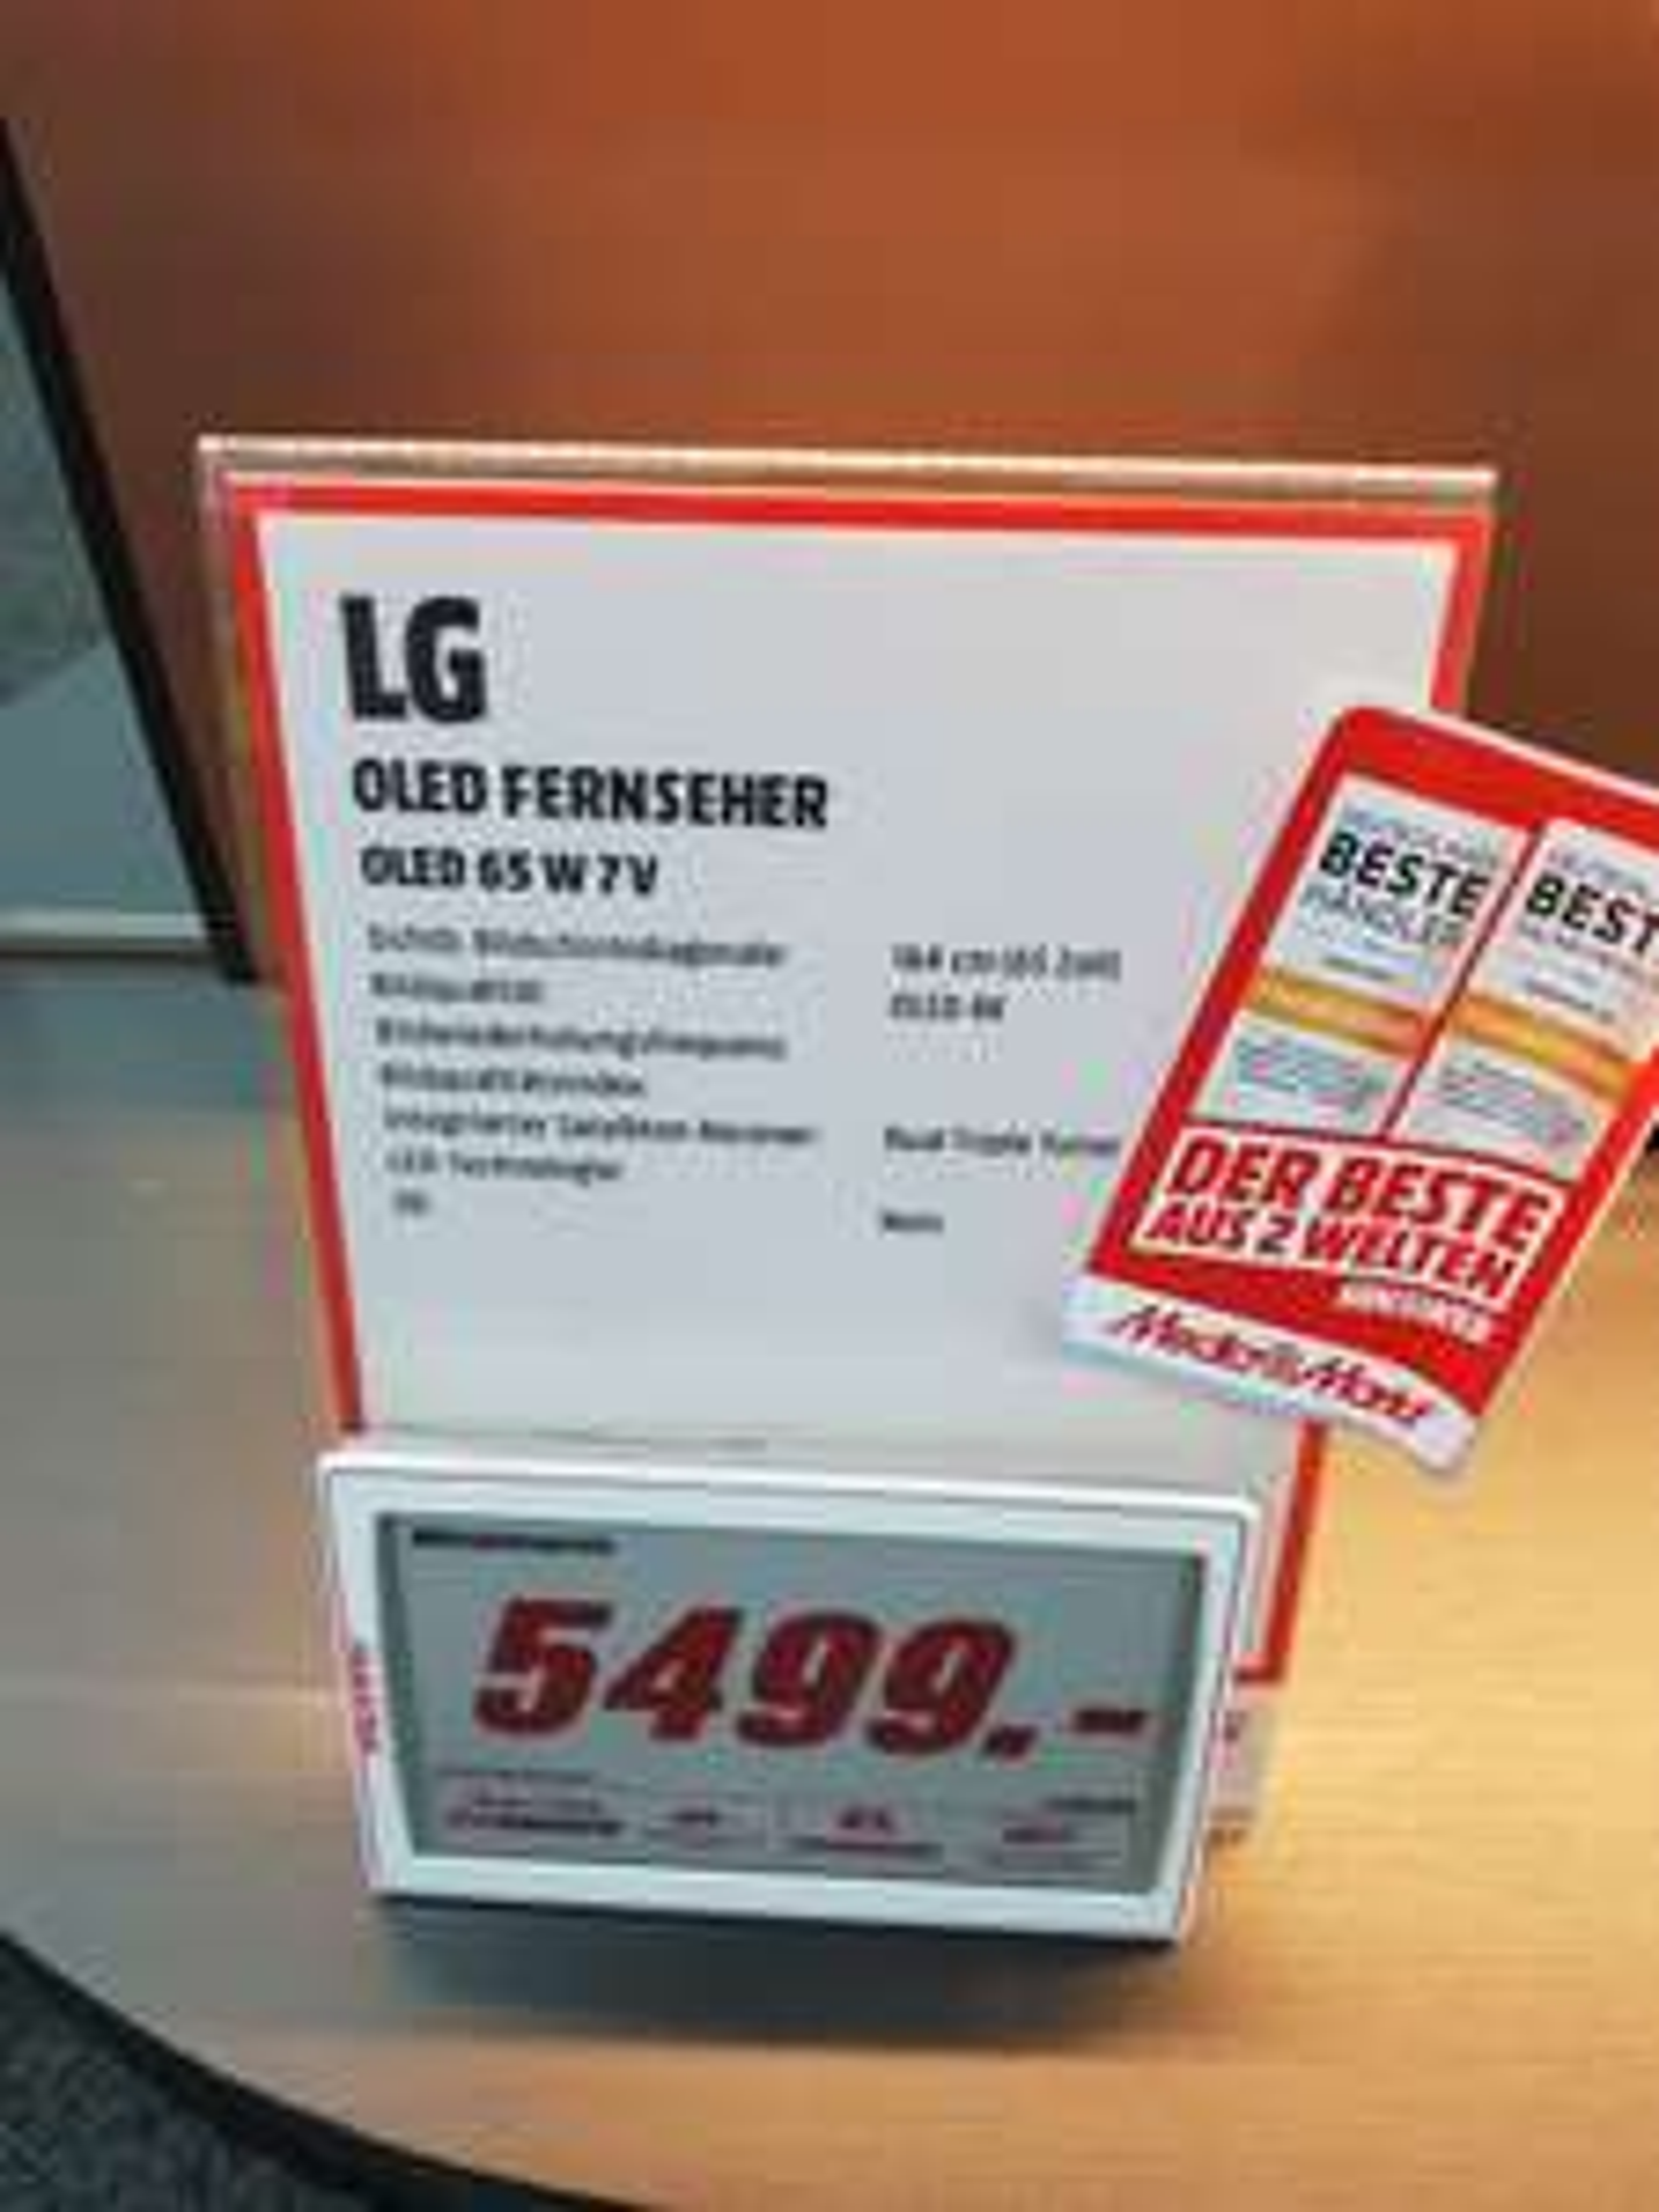 LG Wallpaper W 7 OLED +++5750€+++